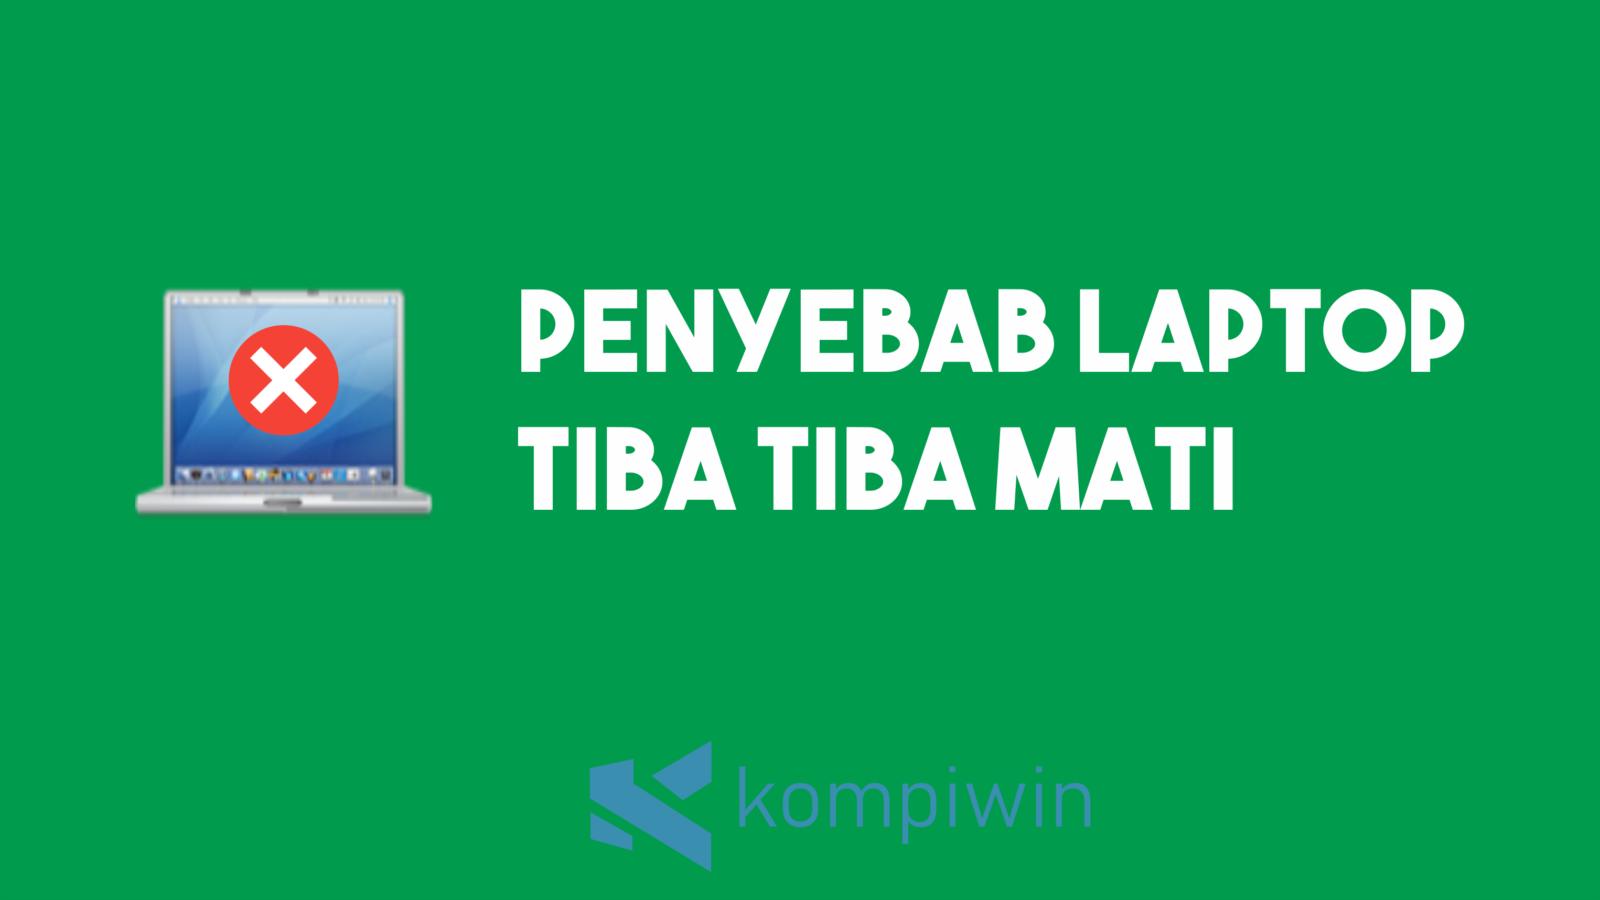 Penyebab Laptop Tiba-Tiba Mati 7